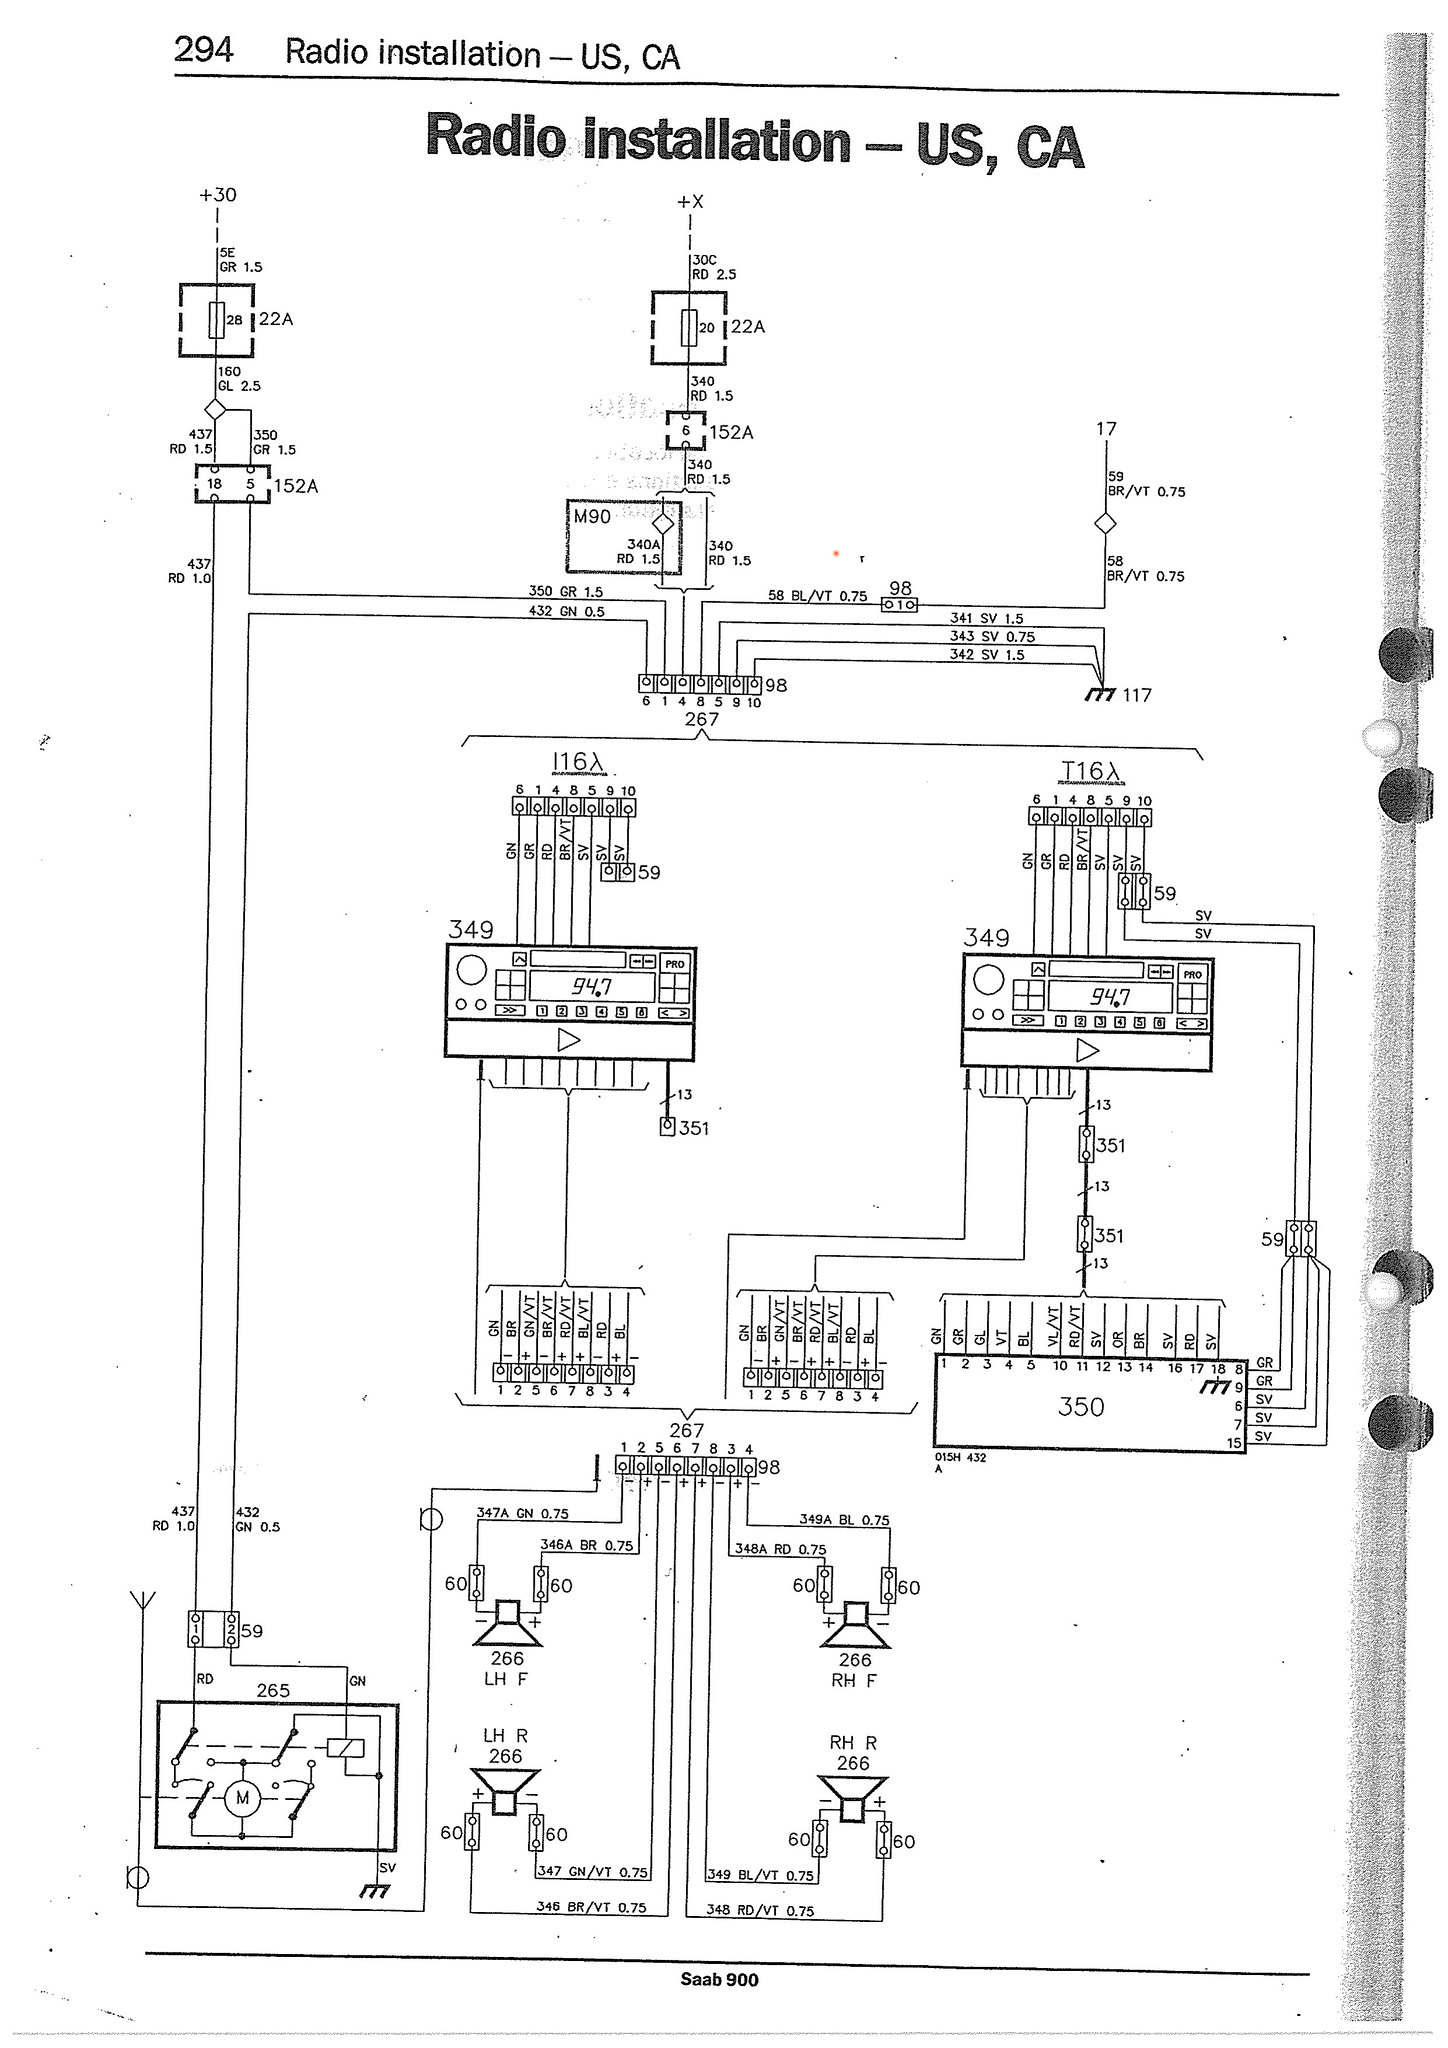 1998 saab 900 wiring diagram el 9379  1996 saab wiring diagram  el 9379  1996 saab wiring diagram